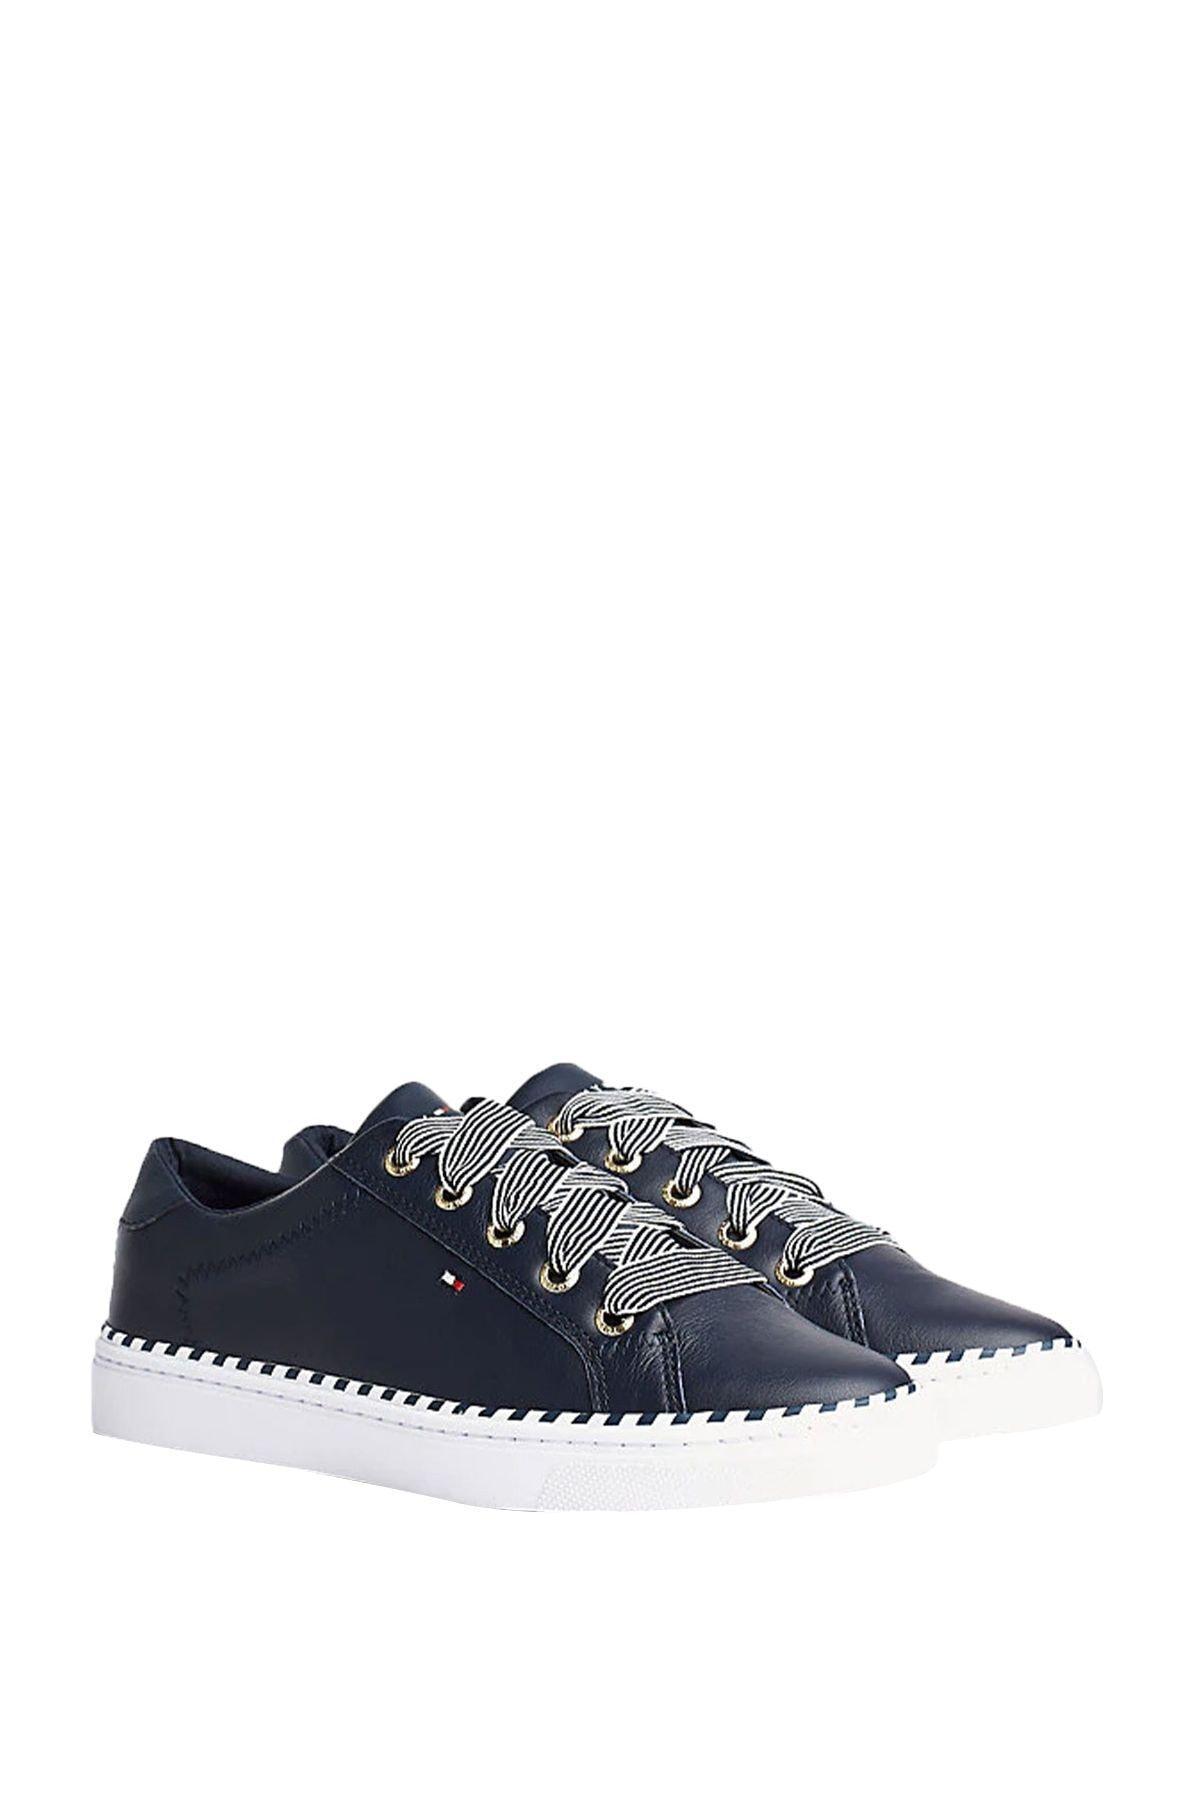 Tommy Hilfiger Kadın Nautical Lace Up Sneaker Fw0fw04689 1